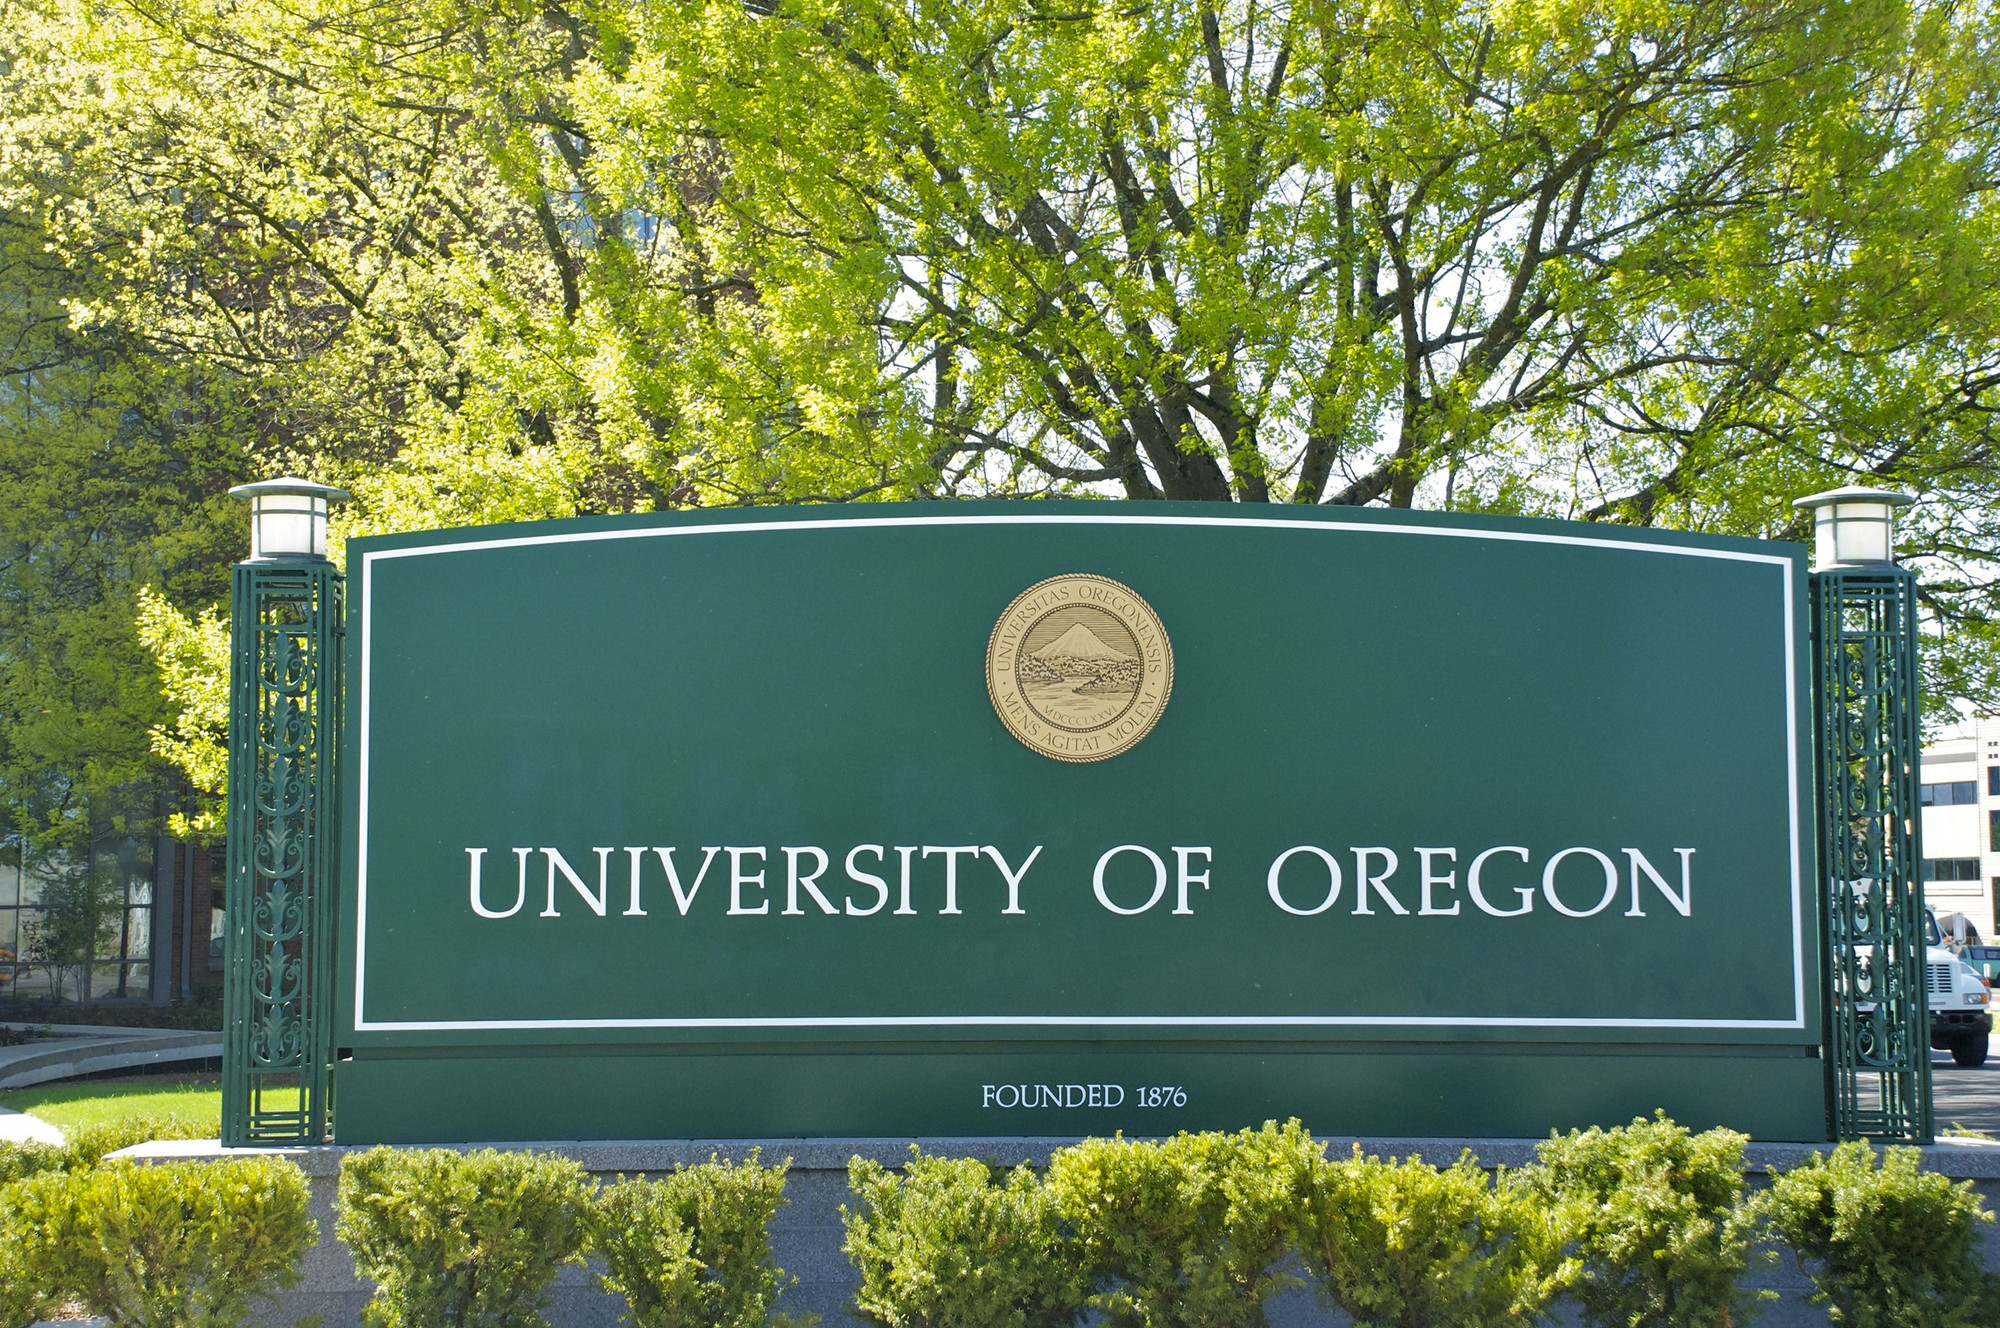 University of Oregon campus sign